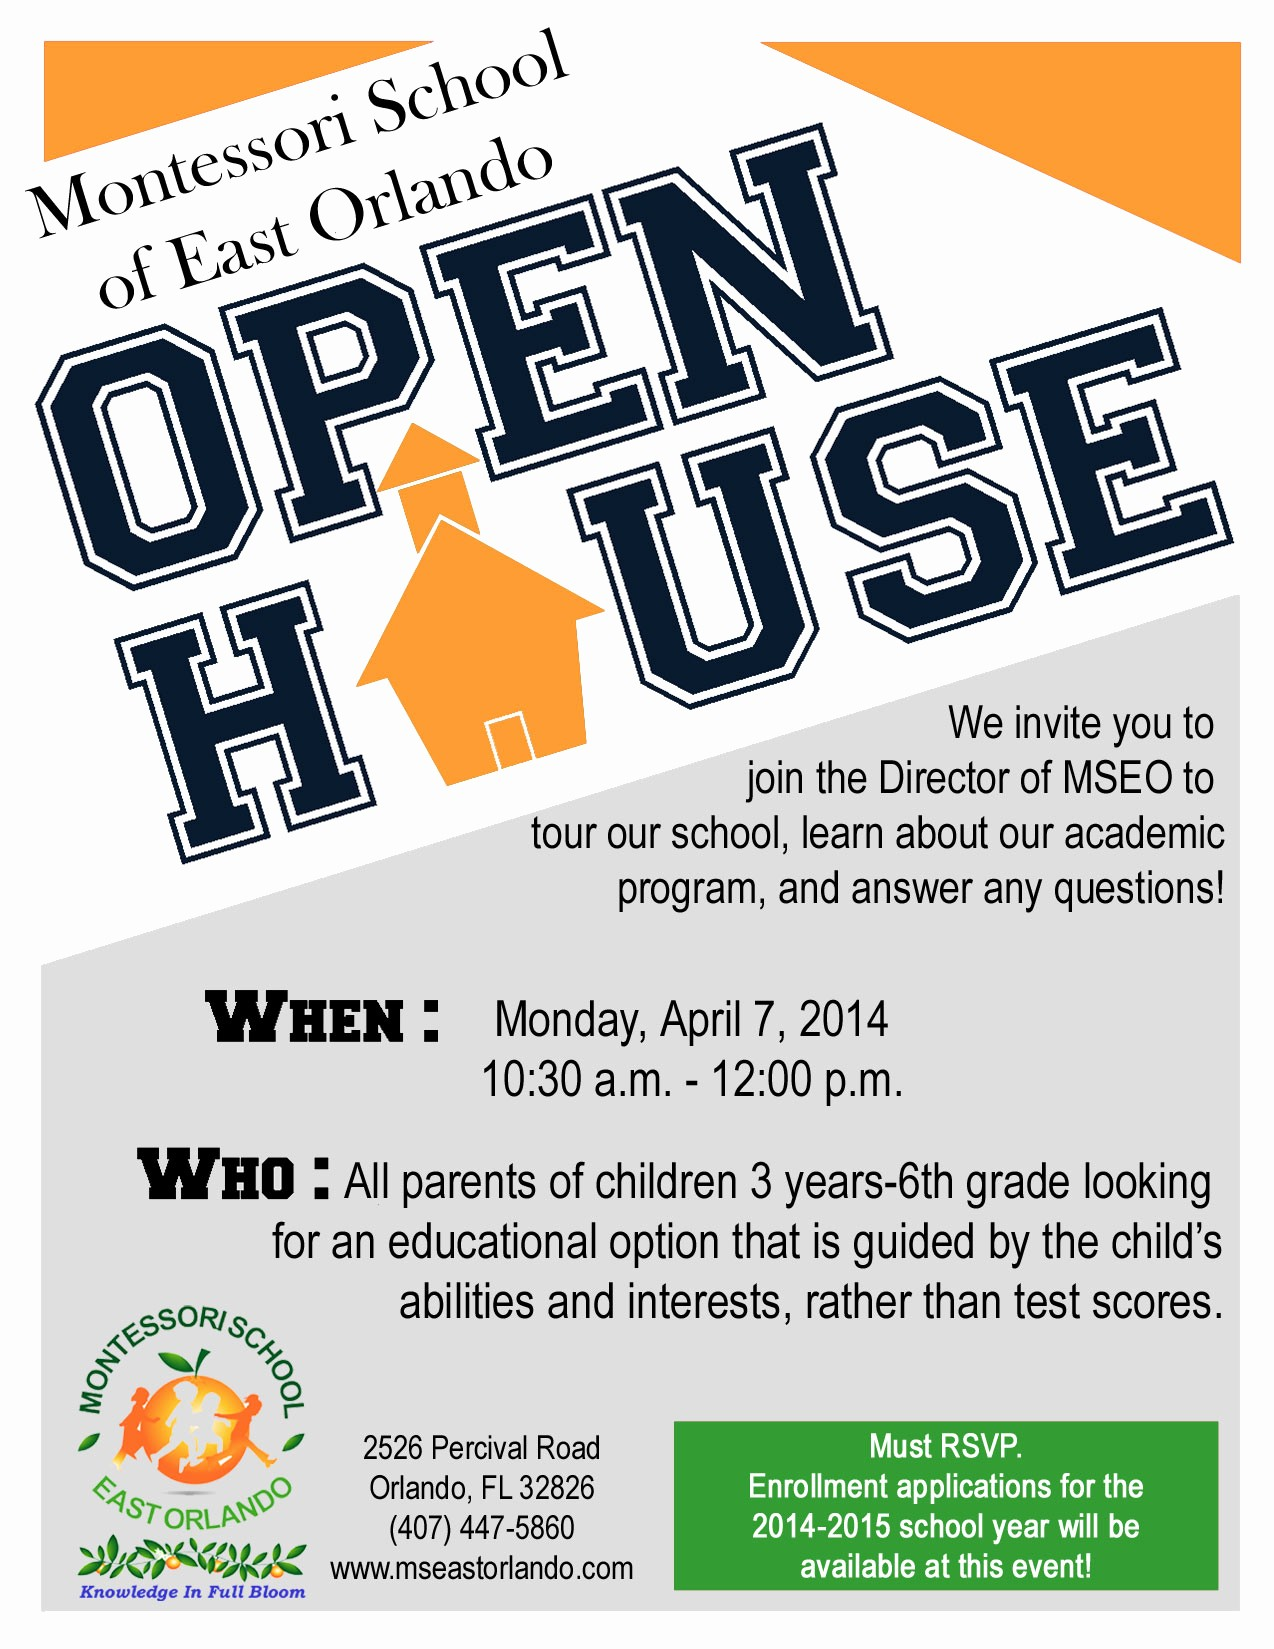 School Open House Invitations Templates New School Open House Flyer Template Portablegasgrillweber